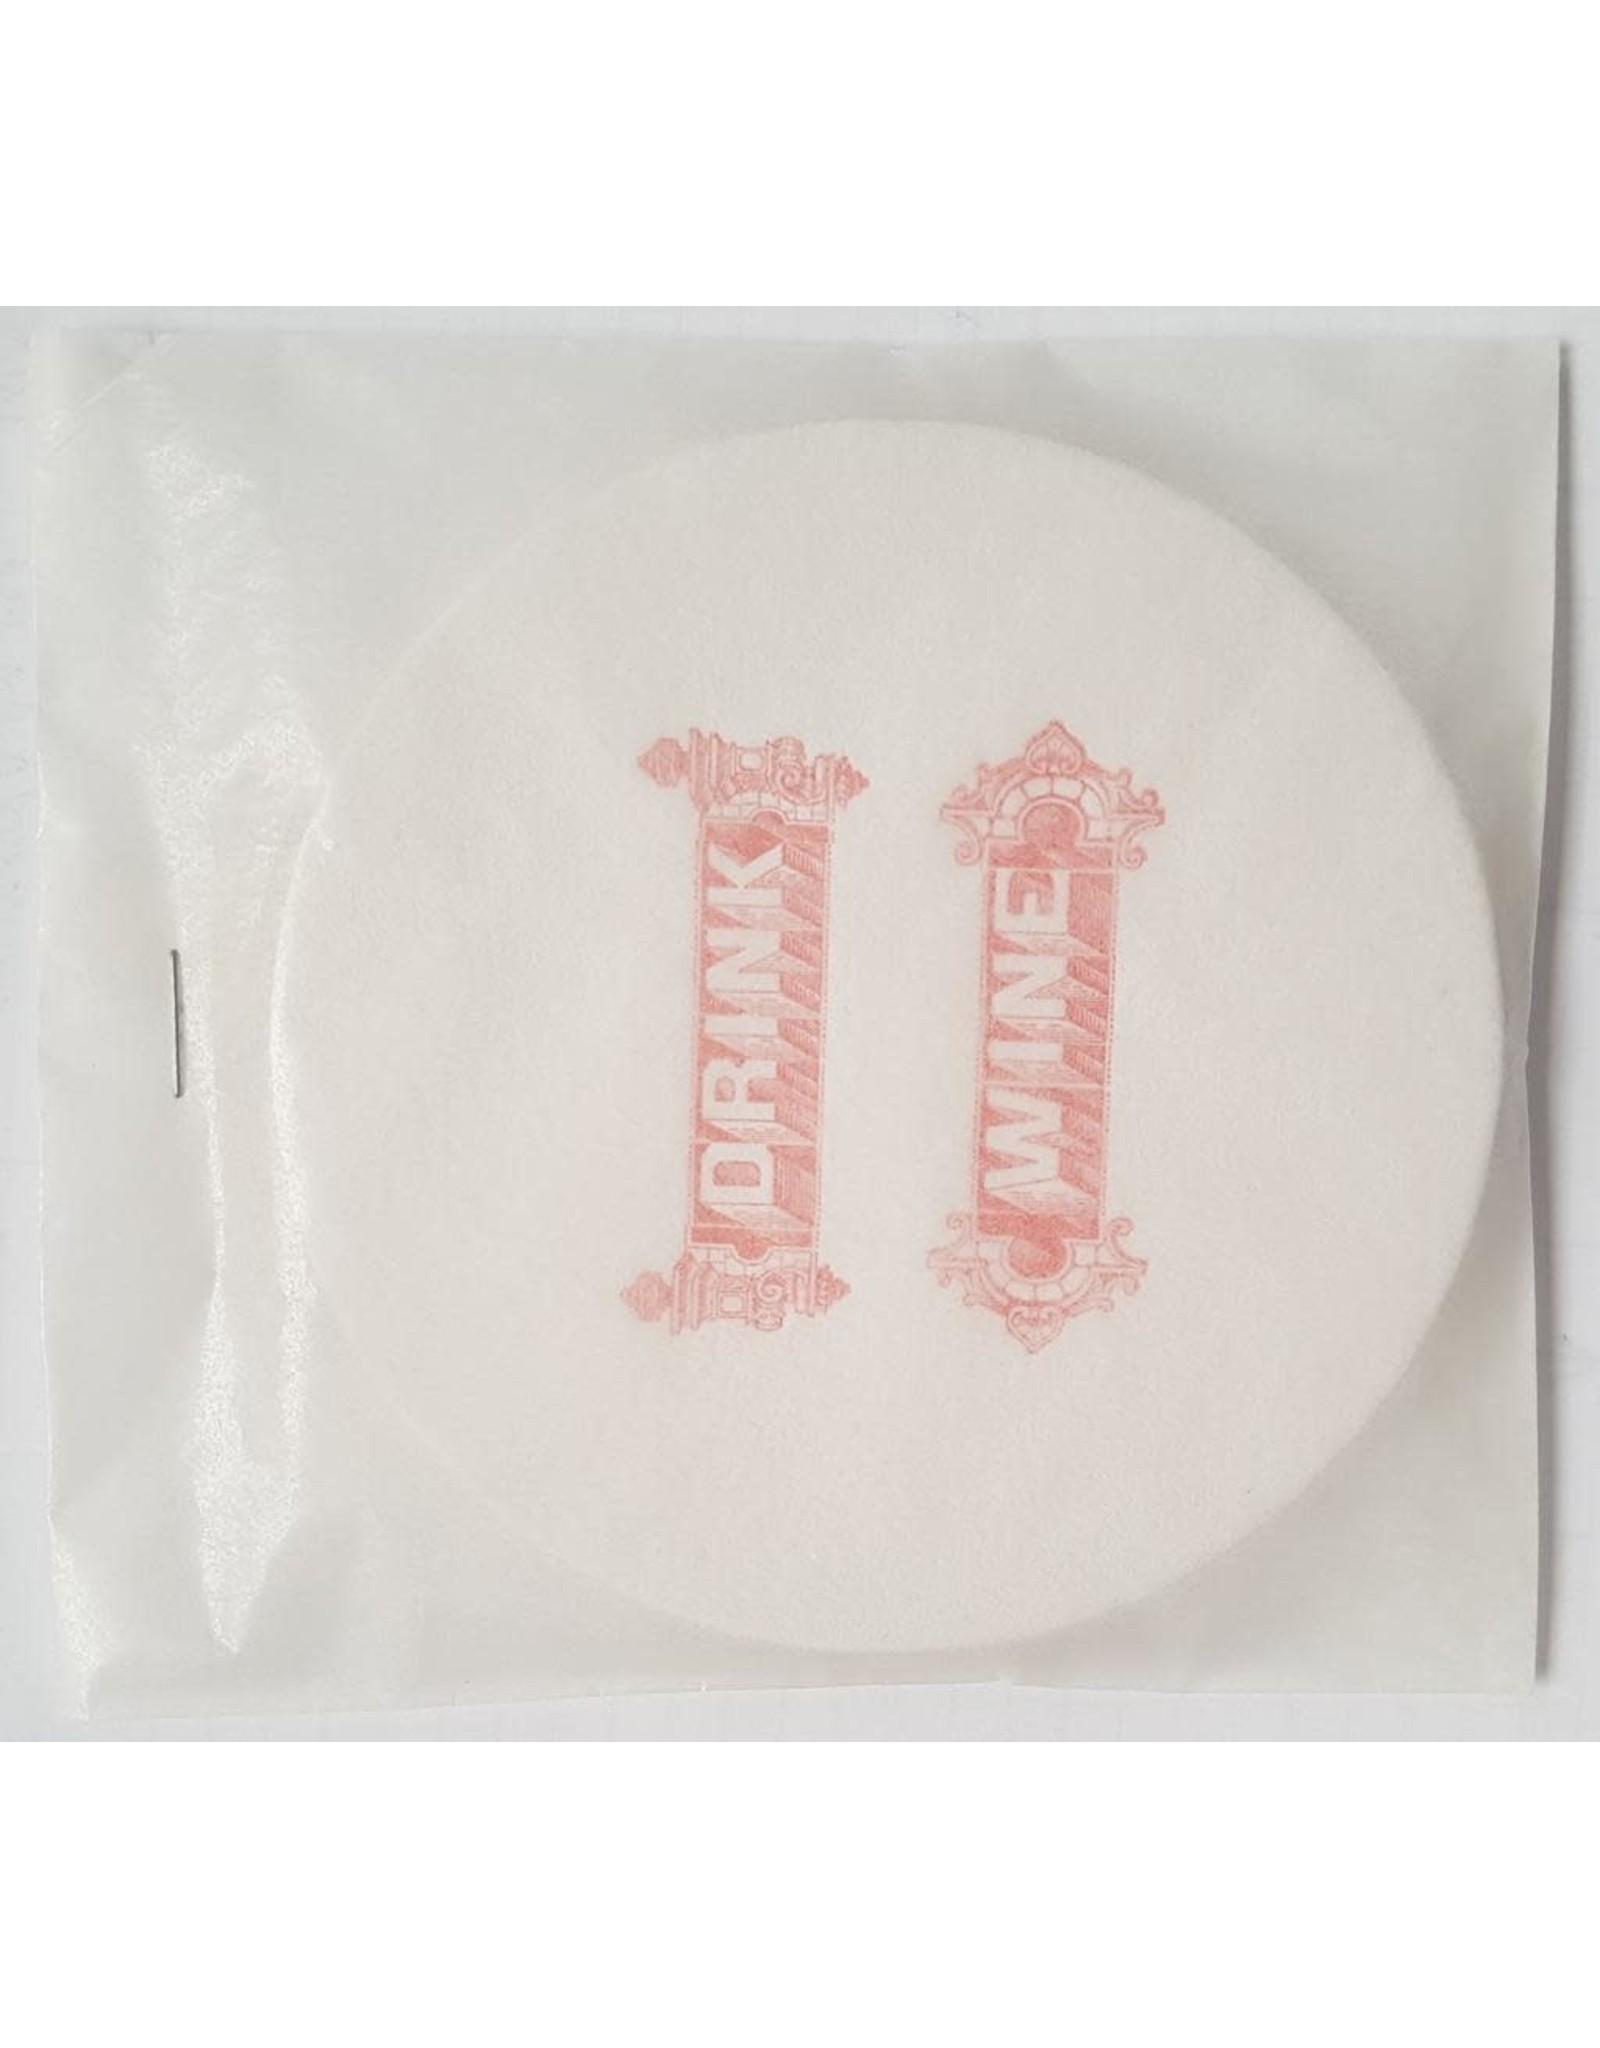 McLachlan, Sean Coasters, set of 4, by Printmonger Press